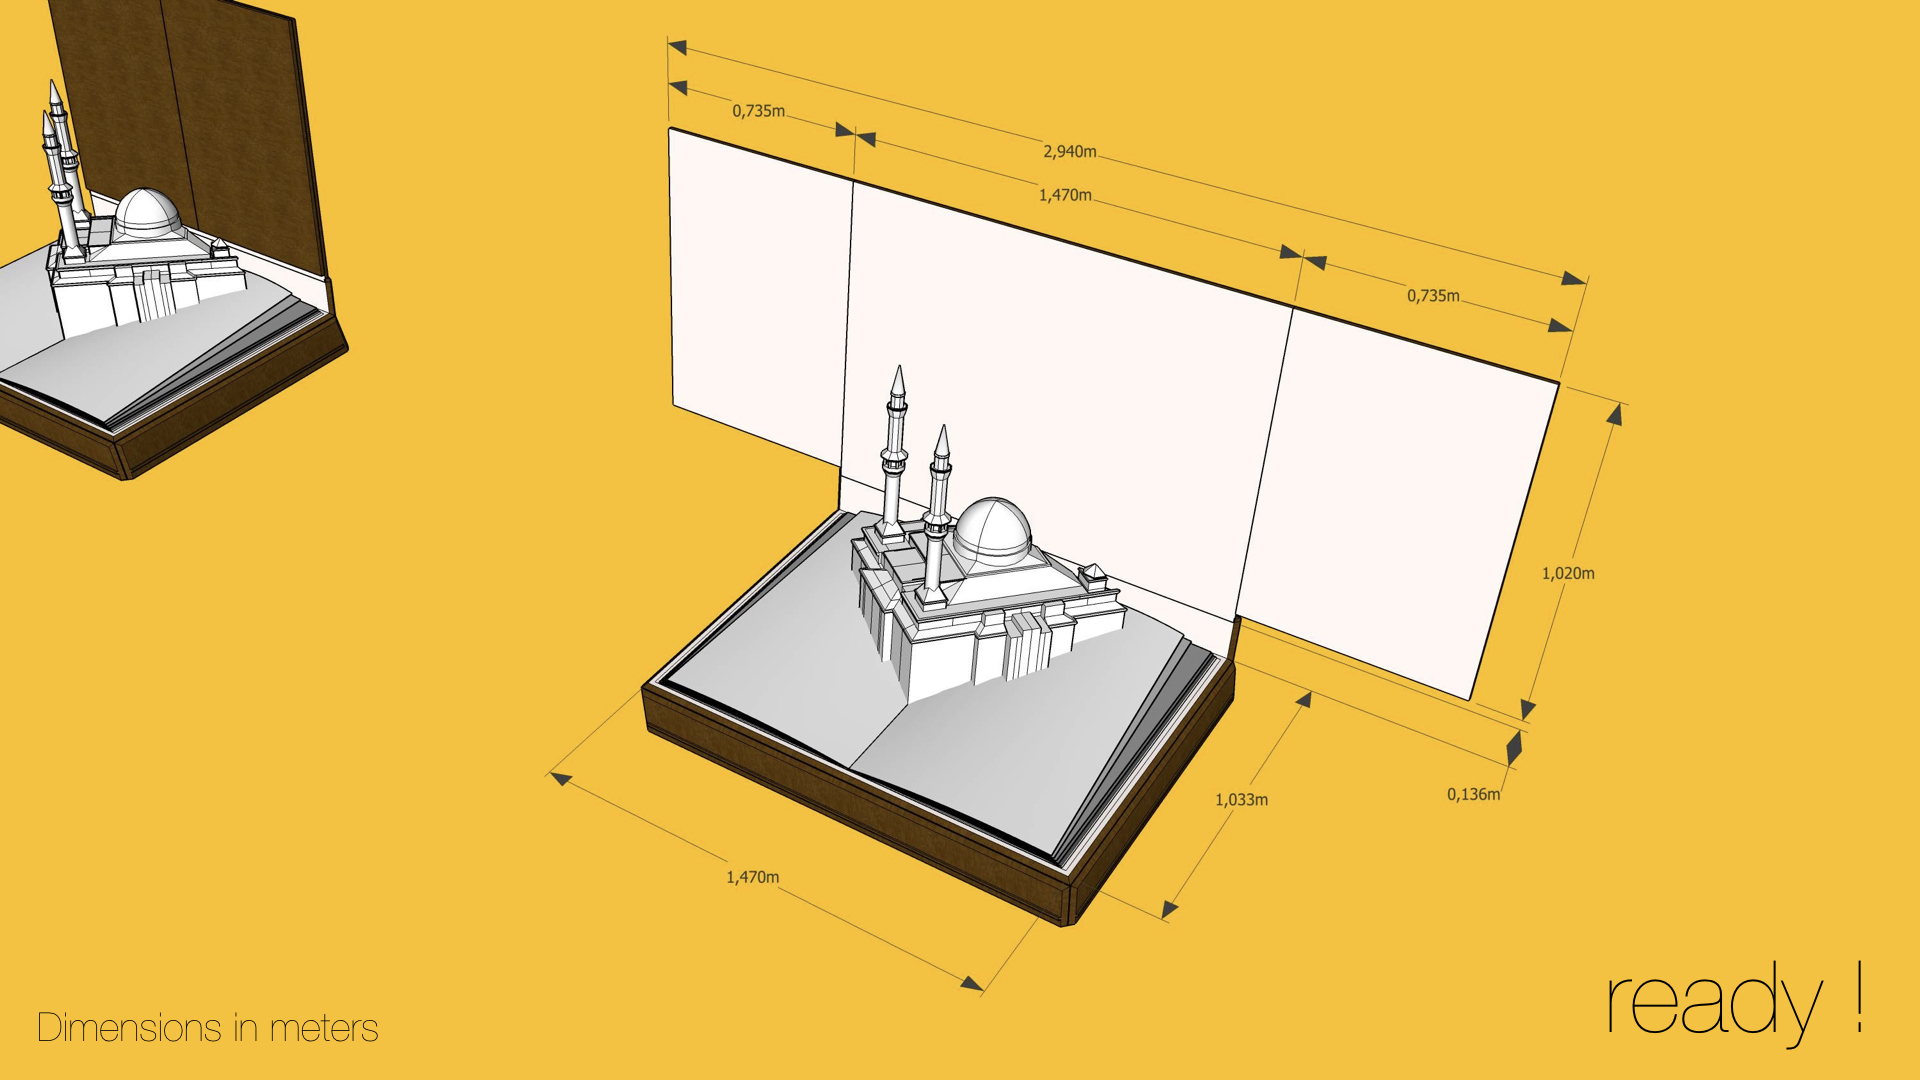 US-14002_CMOM_3DSketch_box_book_study_140618_v2.012.jpeg